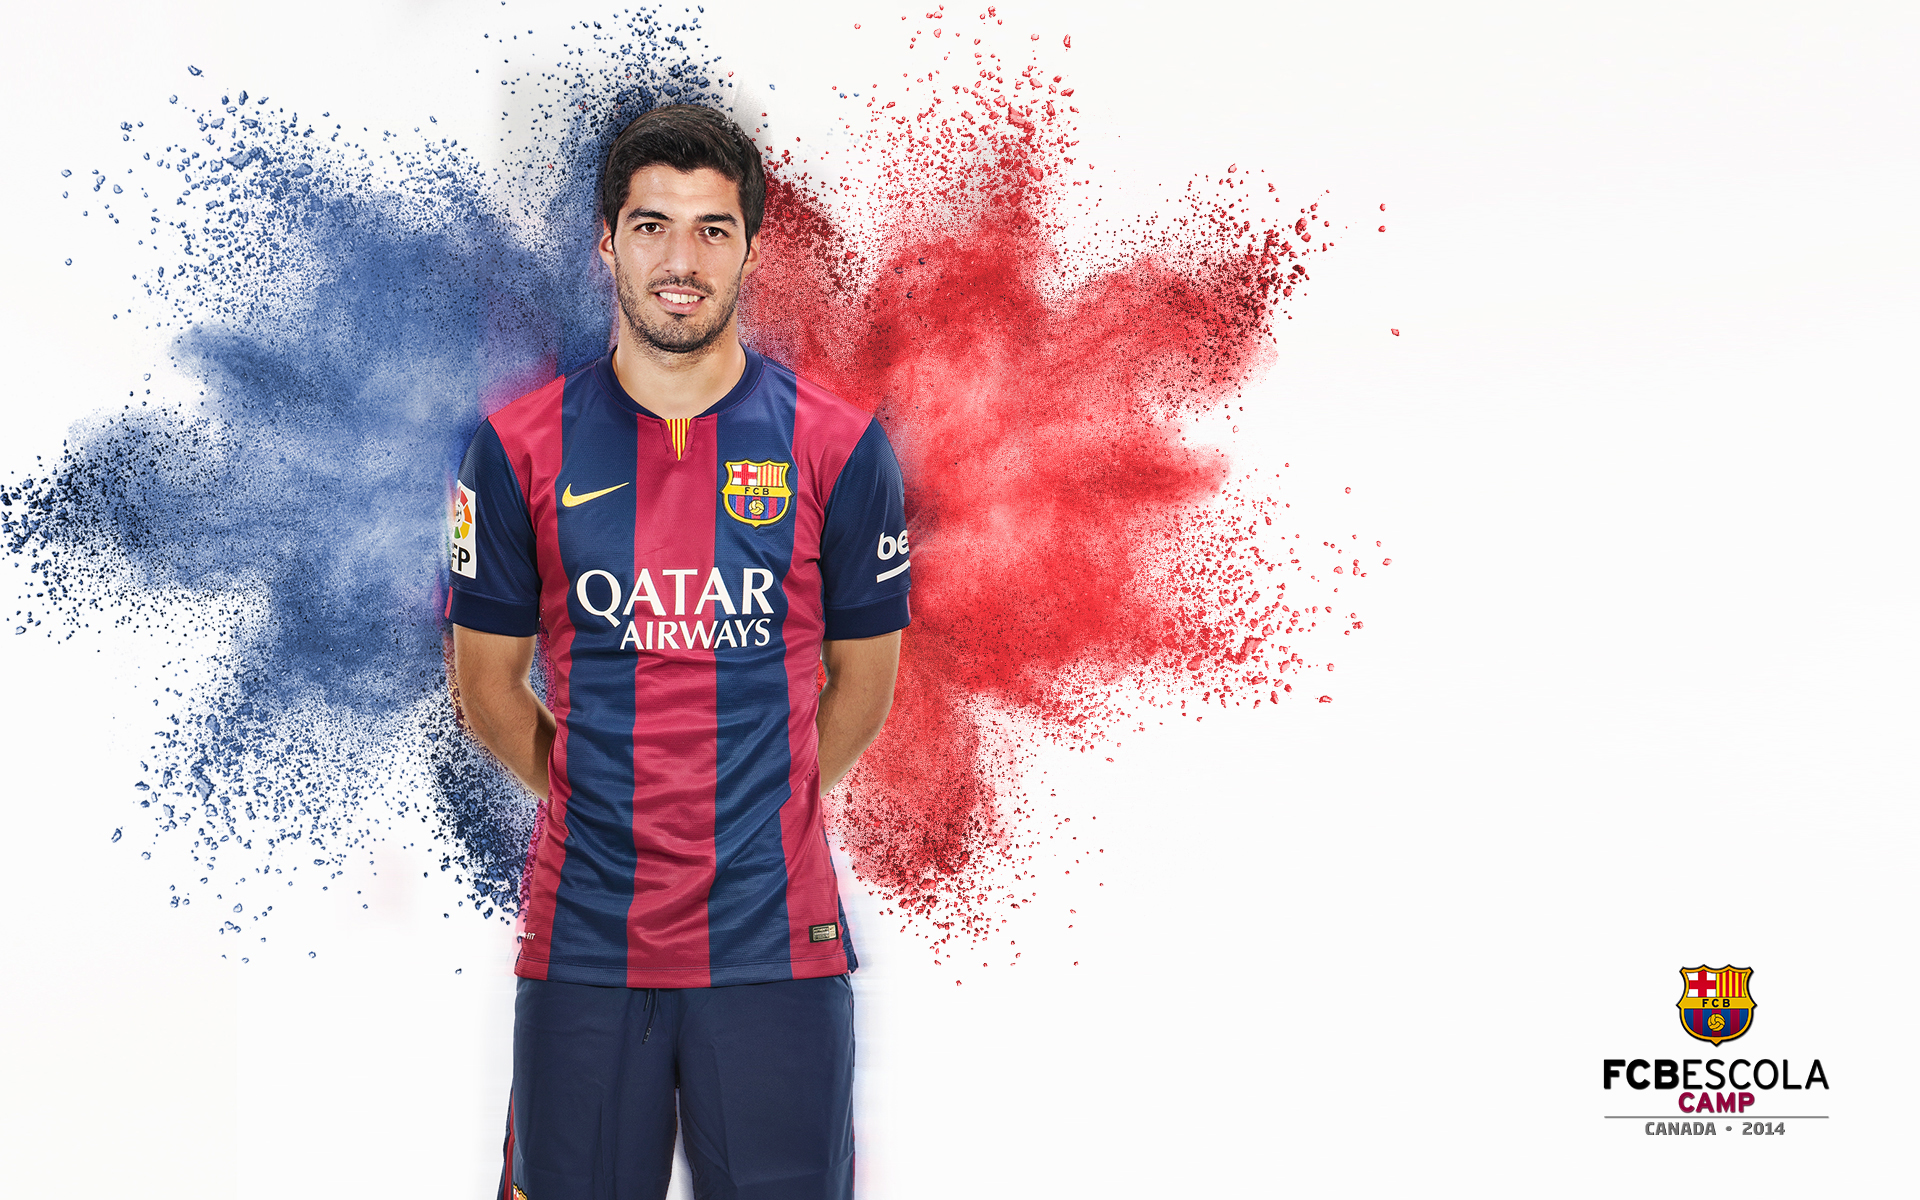 Luis Suarez FC Barcelona Club Player Wallpaper 1920x1200